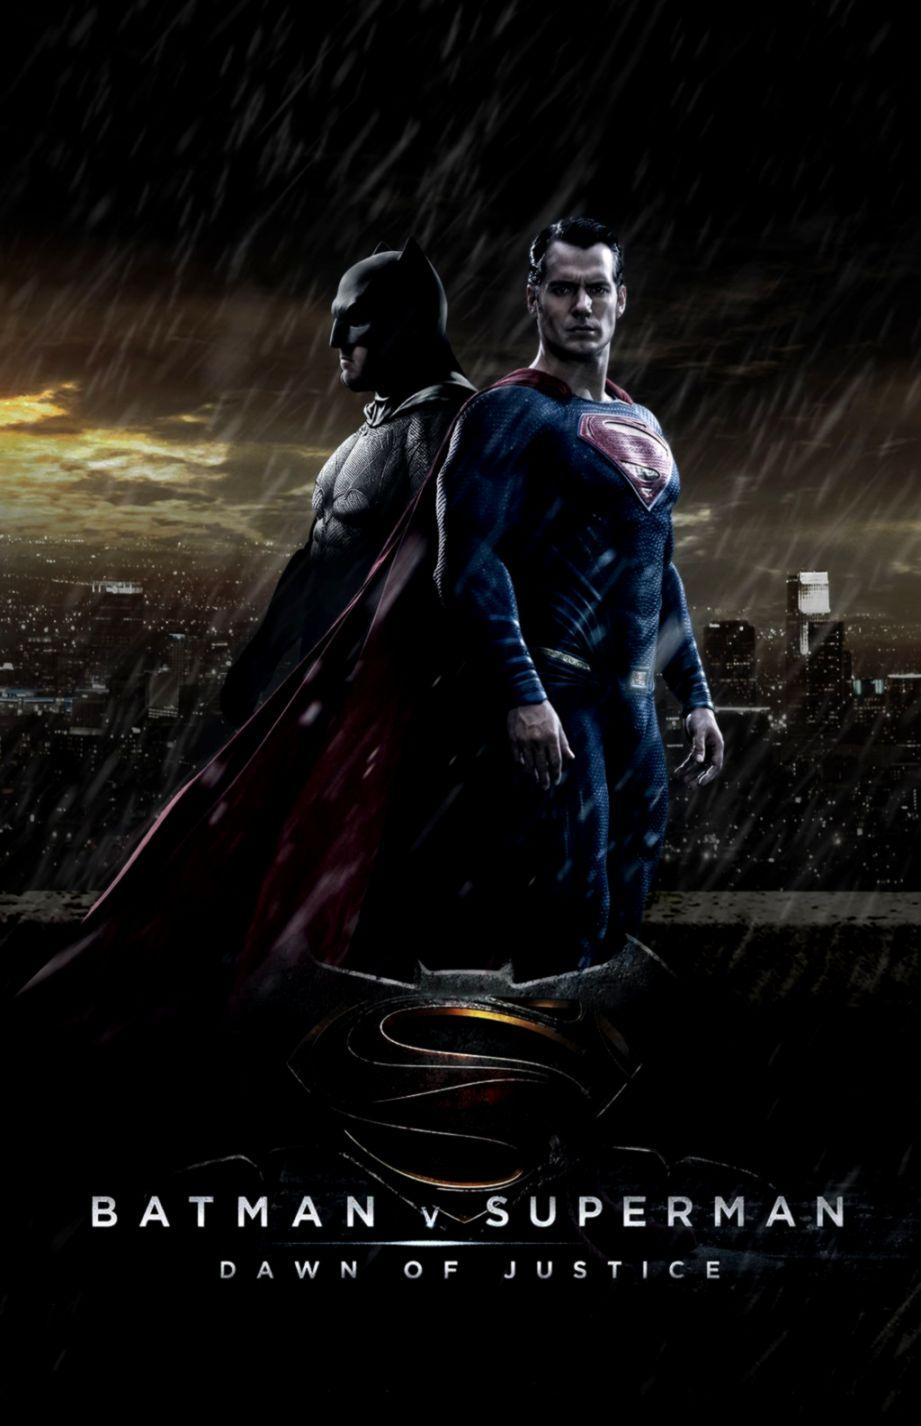 batman vs superman movie free download